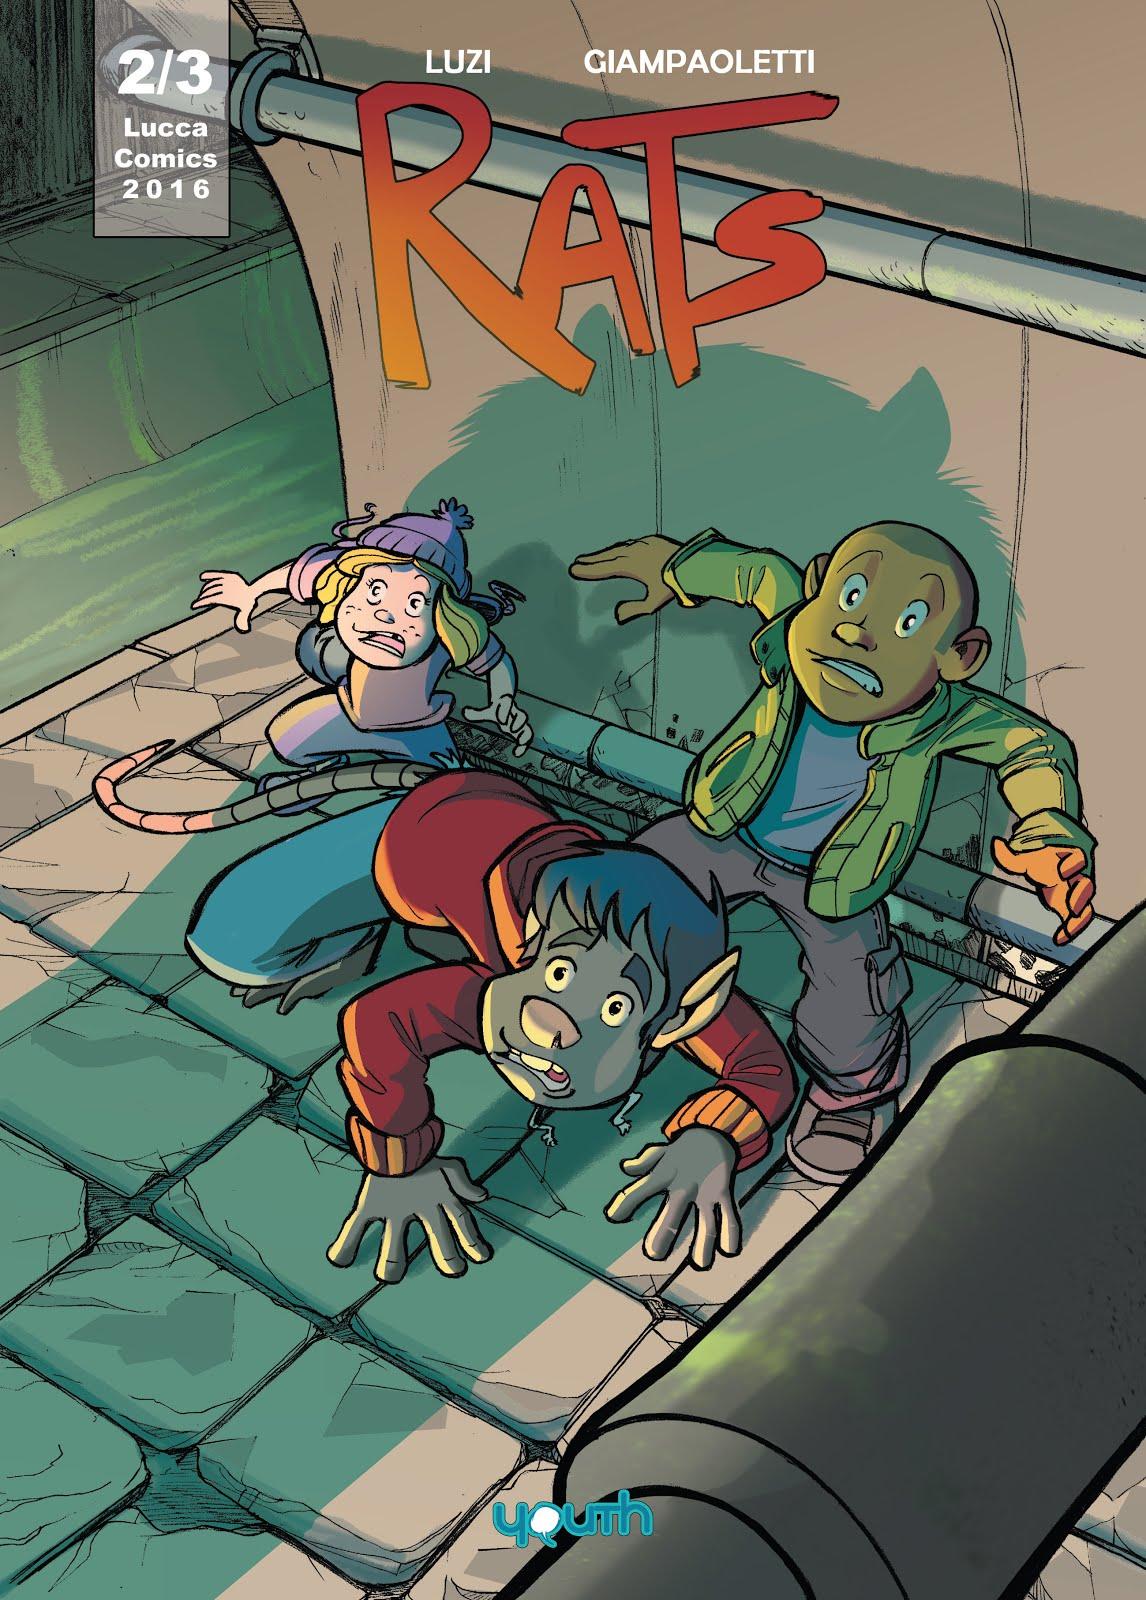 RATS Volume 2